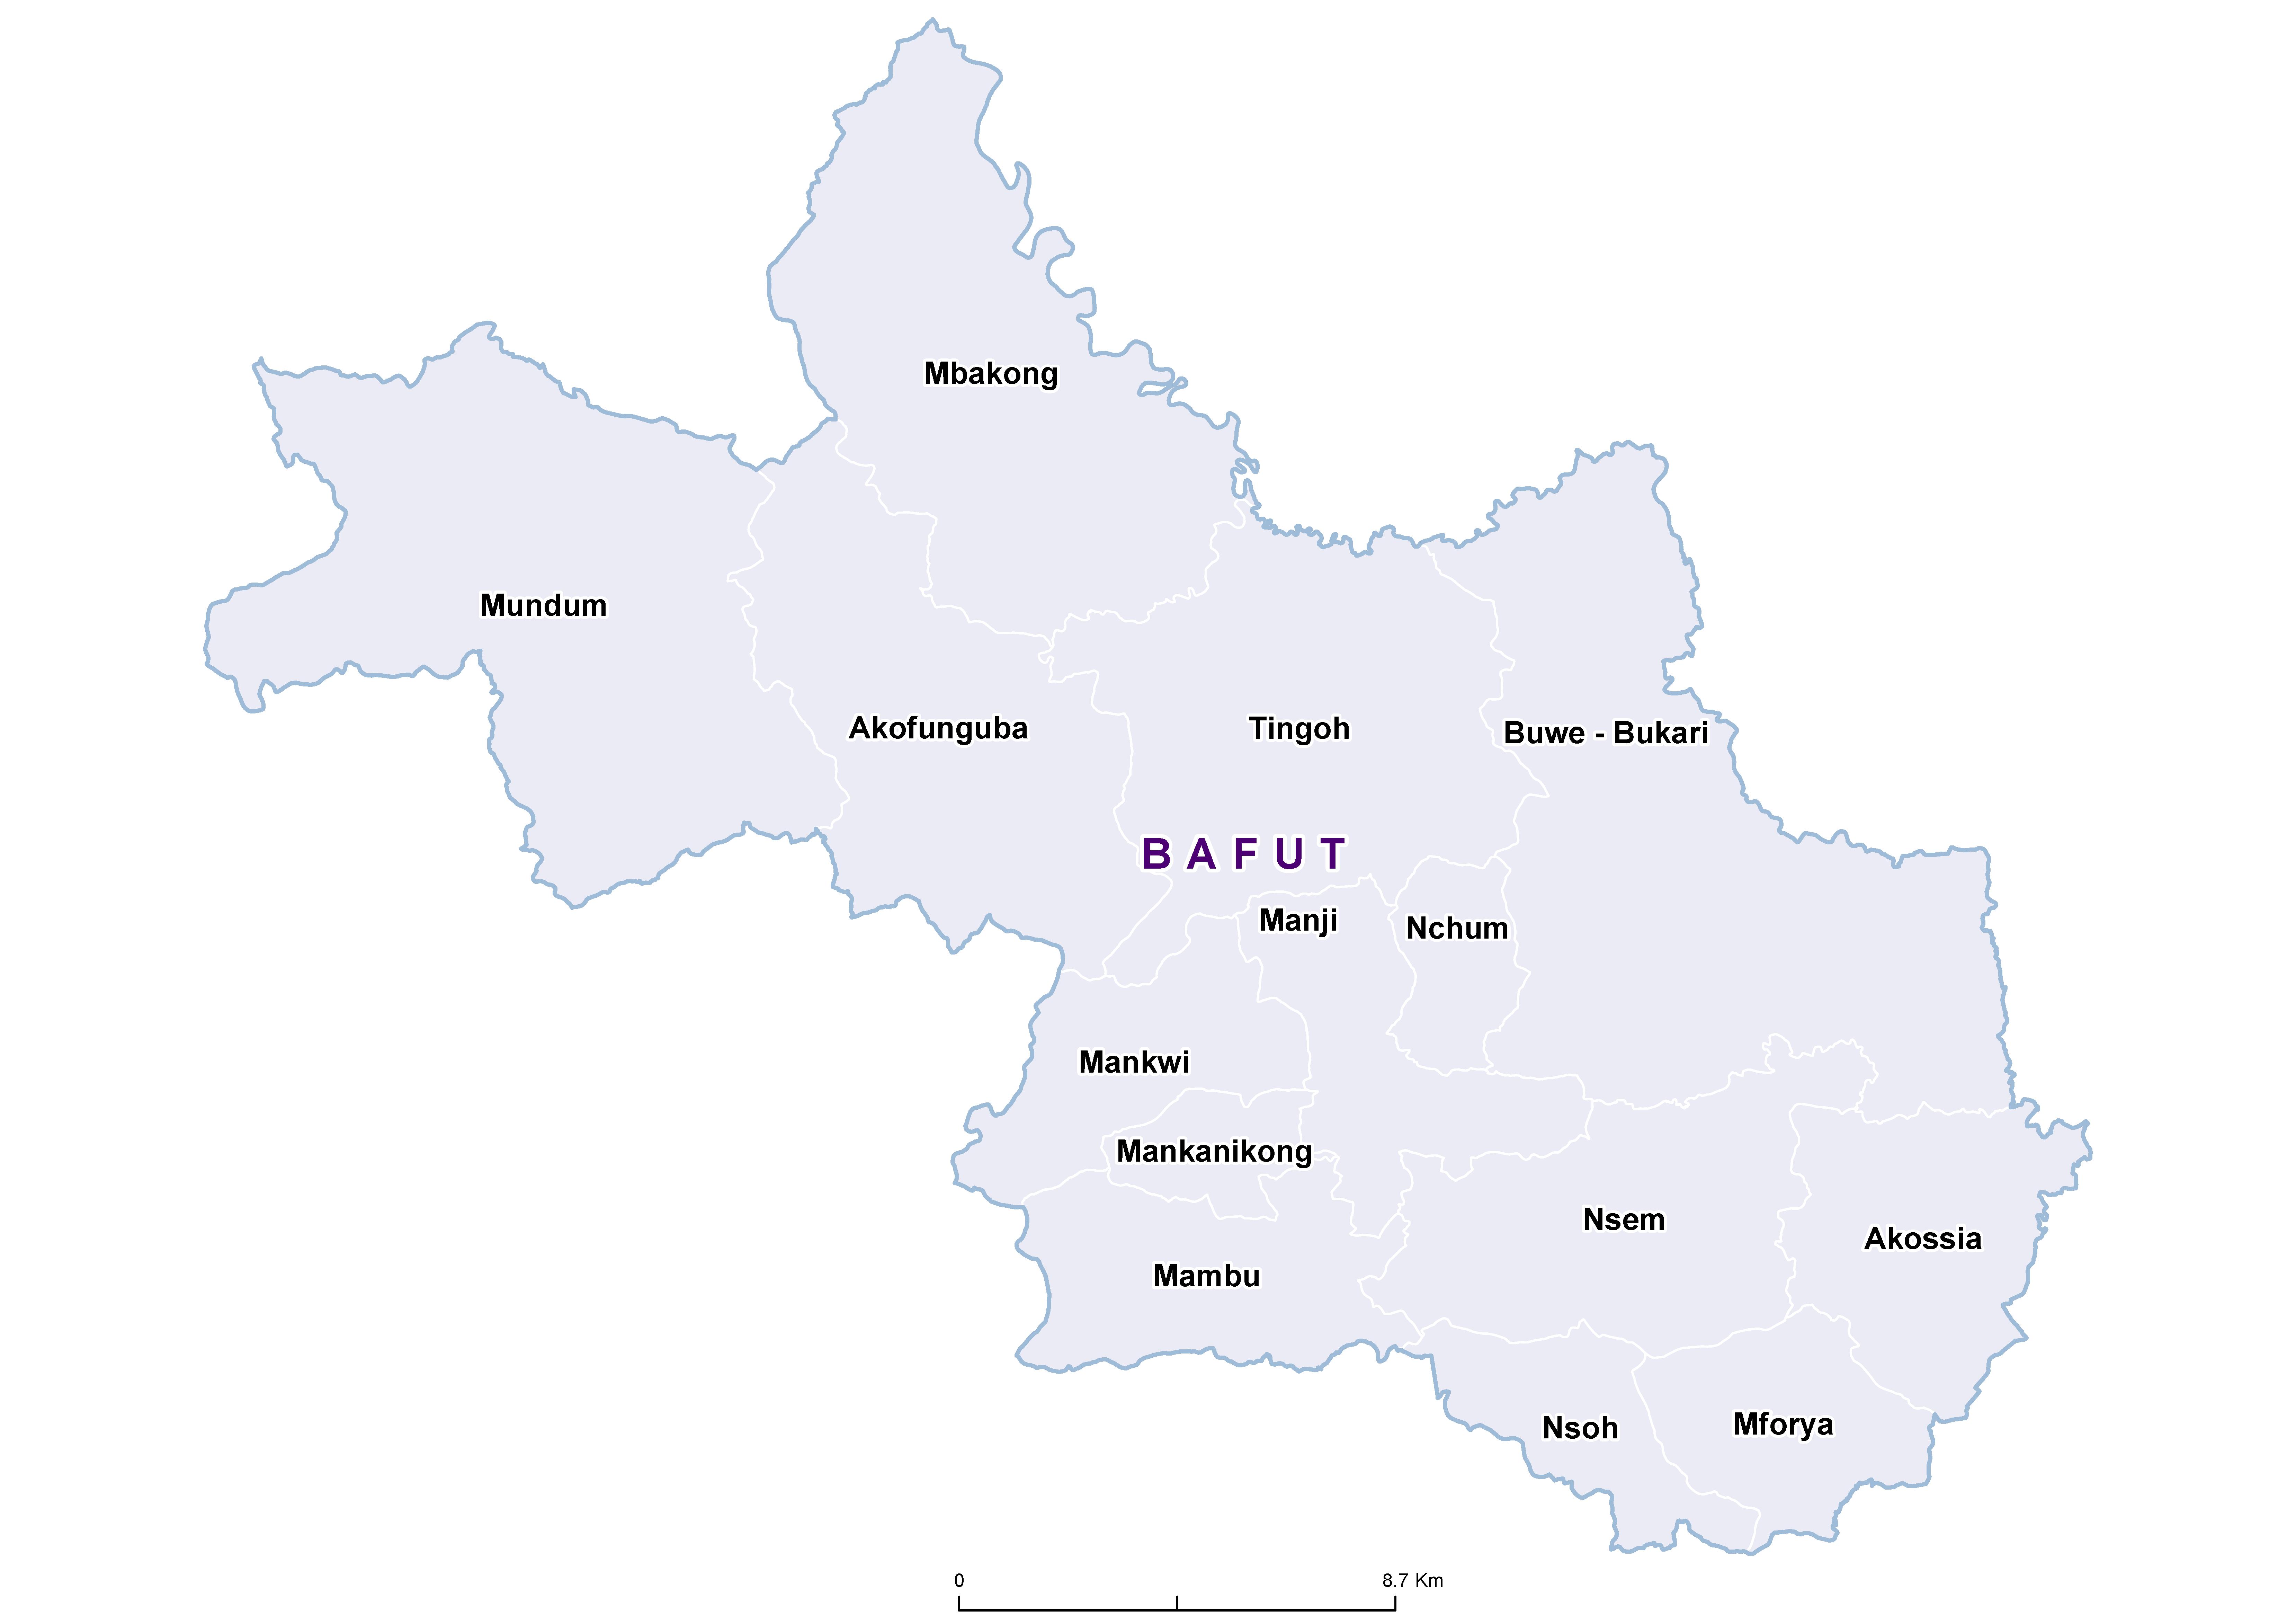 Bafut STH 20180001